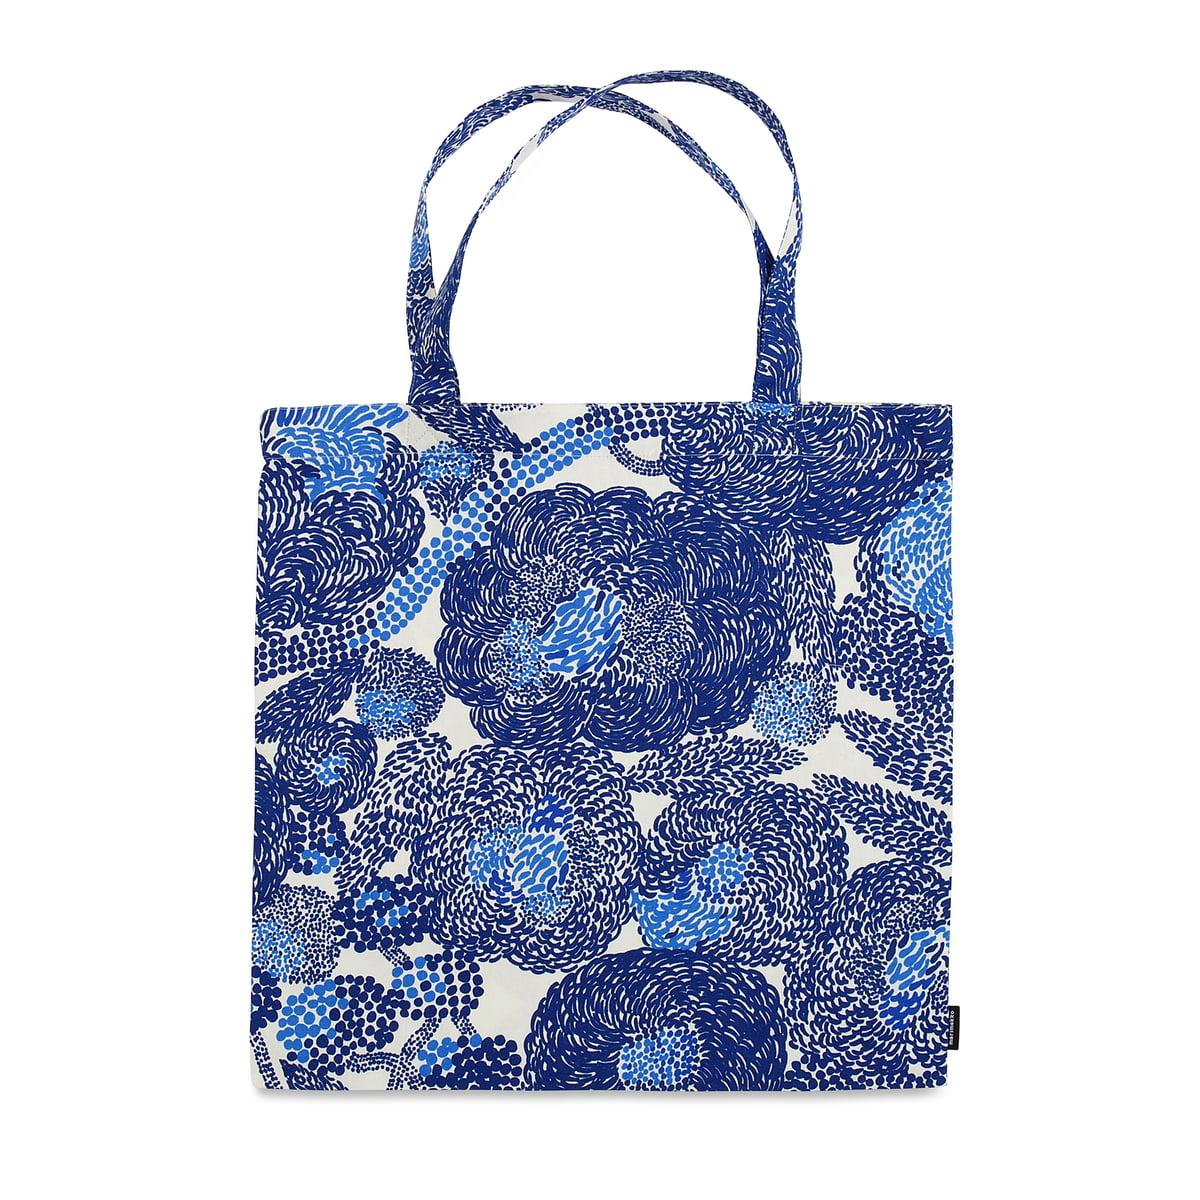 The Marimekko Mynsteri Ping Bag Grey White Spring 2018